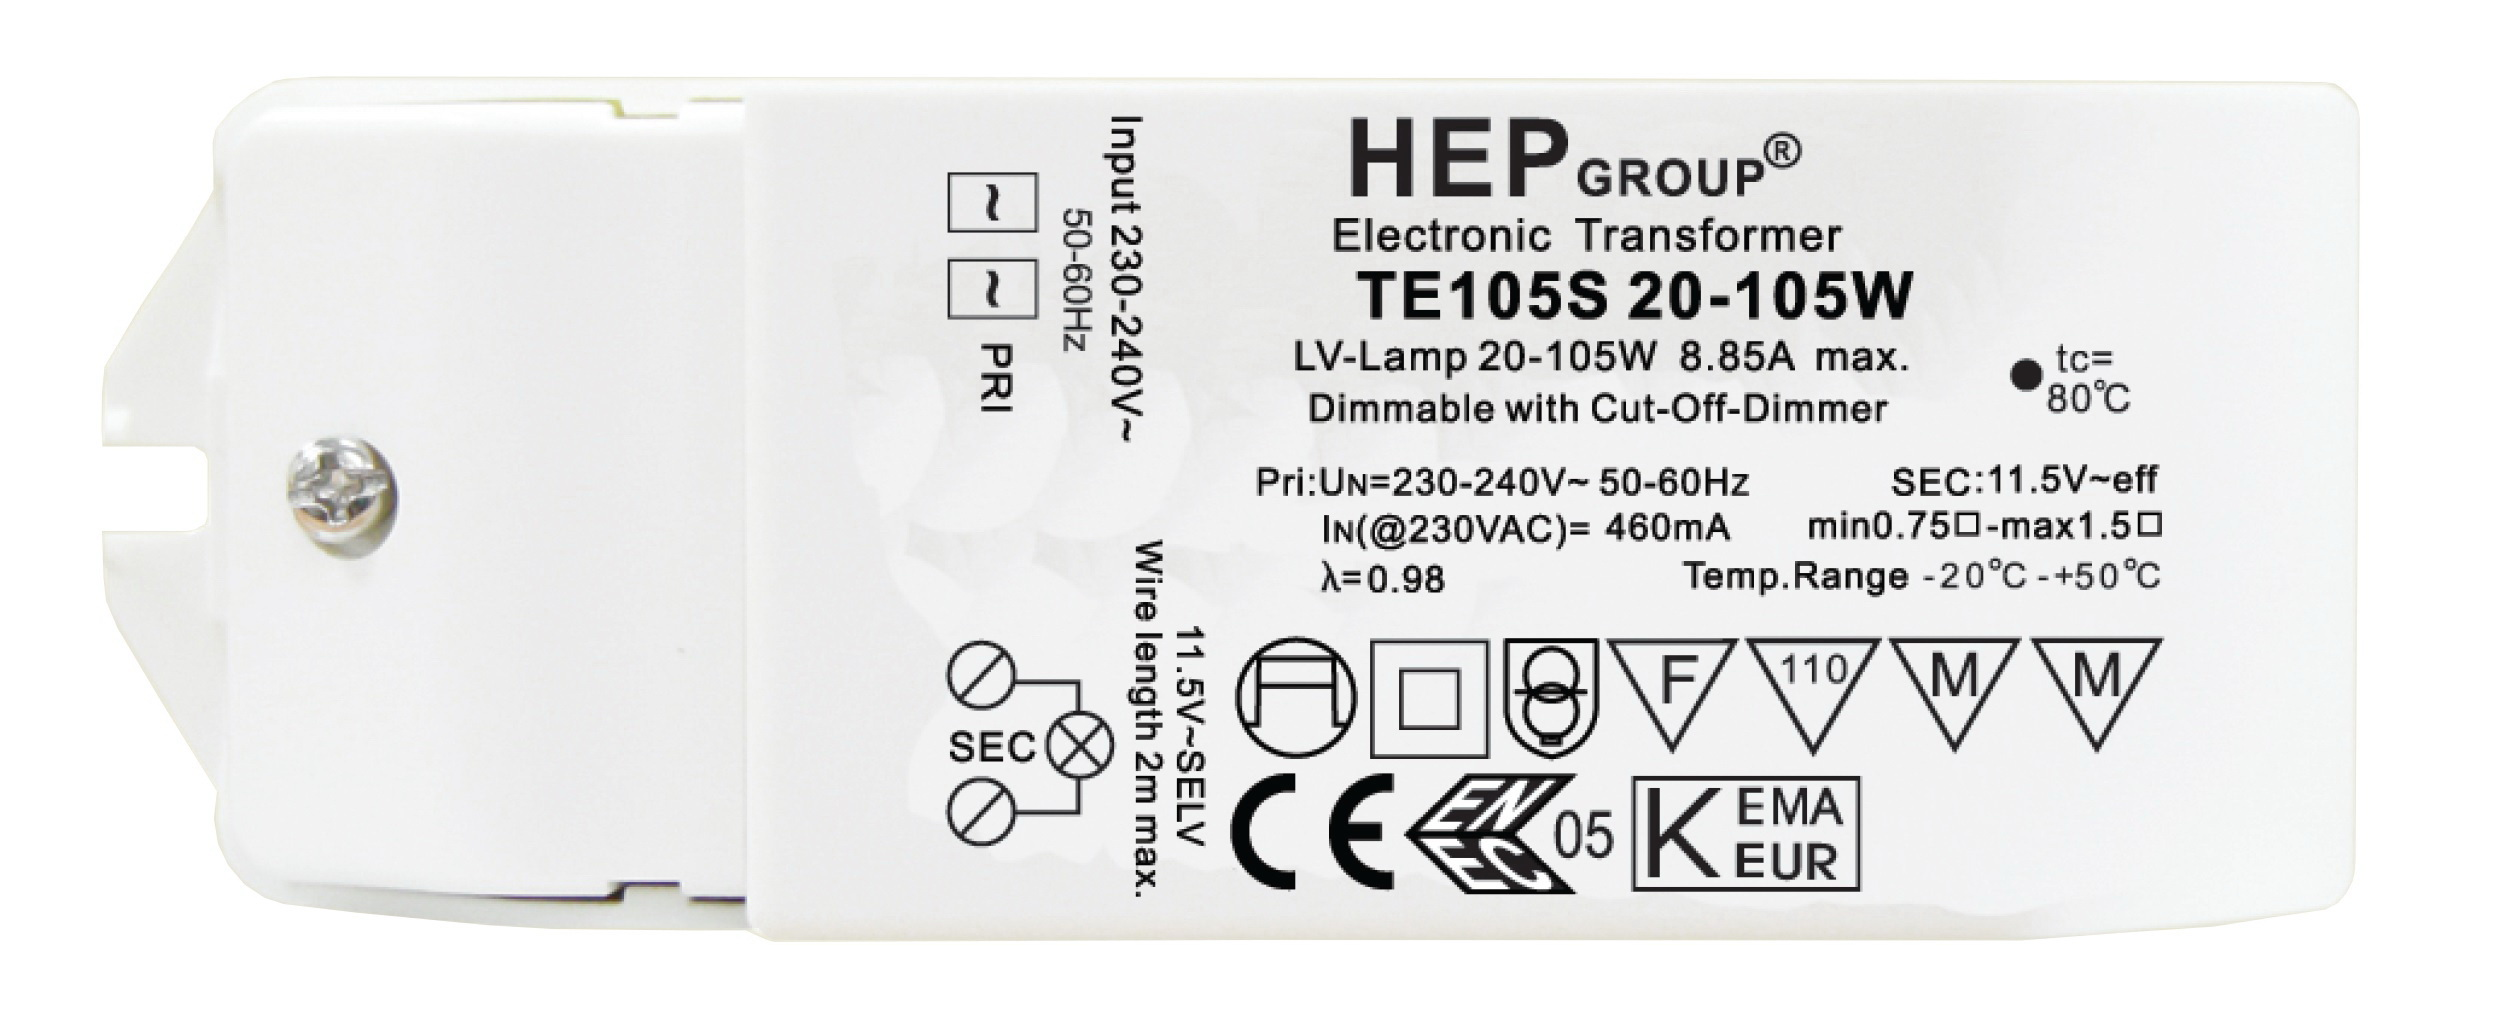 1 Stk Elektronischer Transformator, 240/12V, 10-60VA, Dimm LI5ZTI60S-